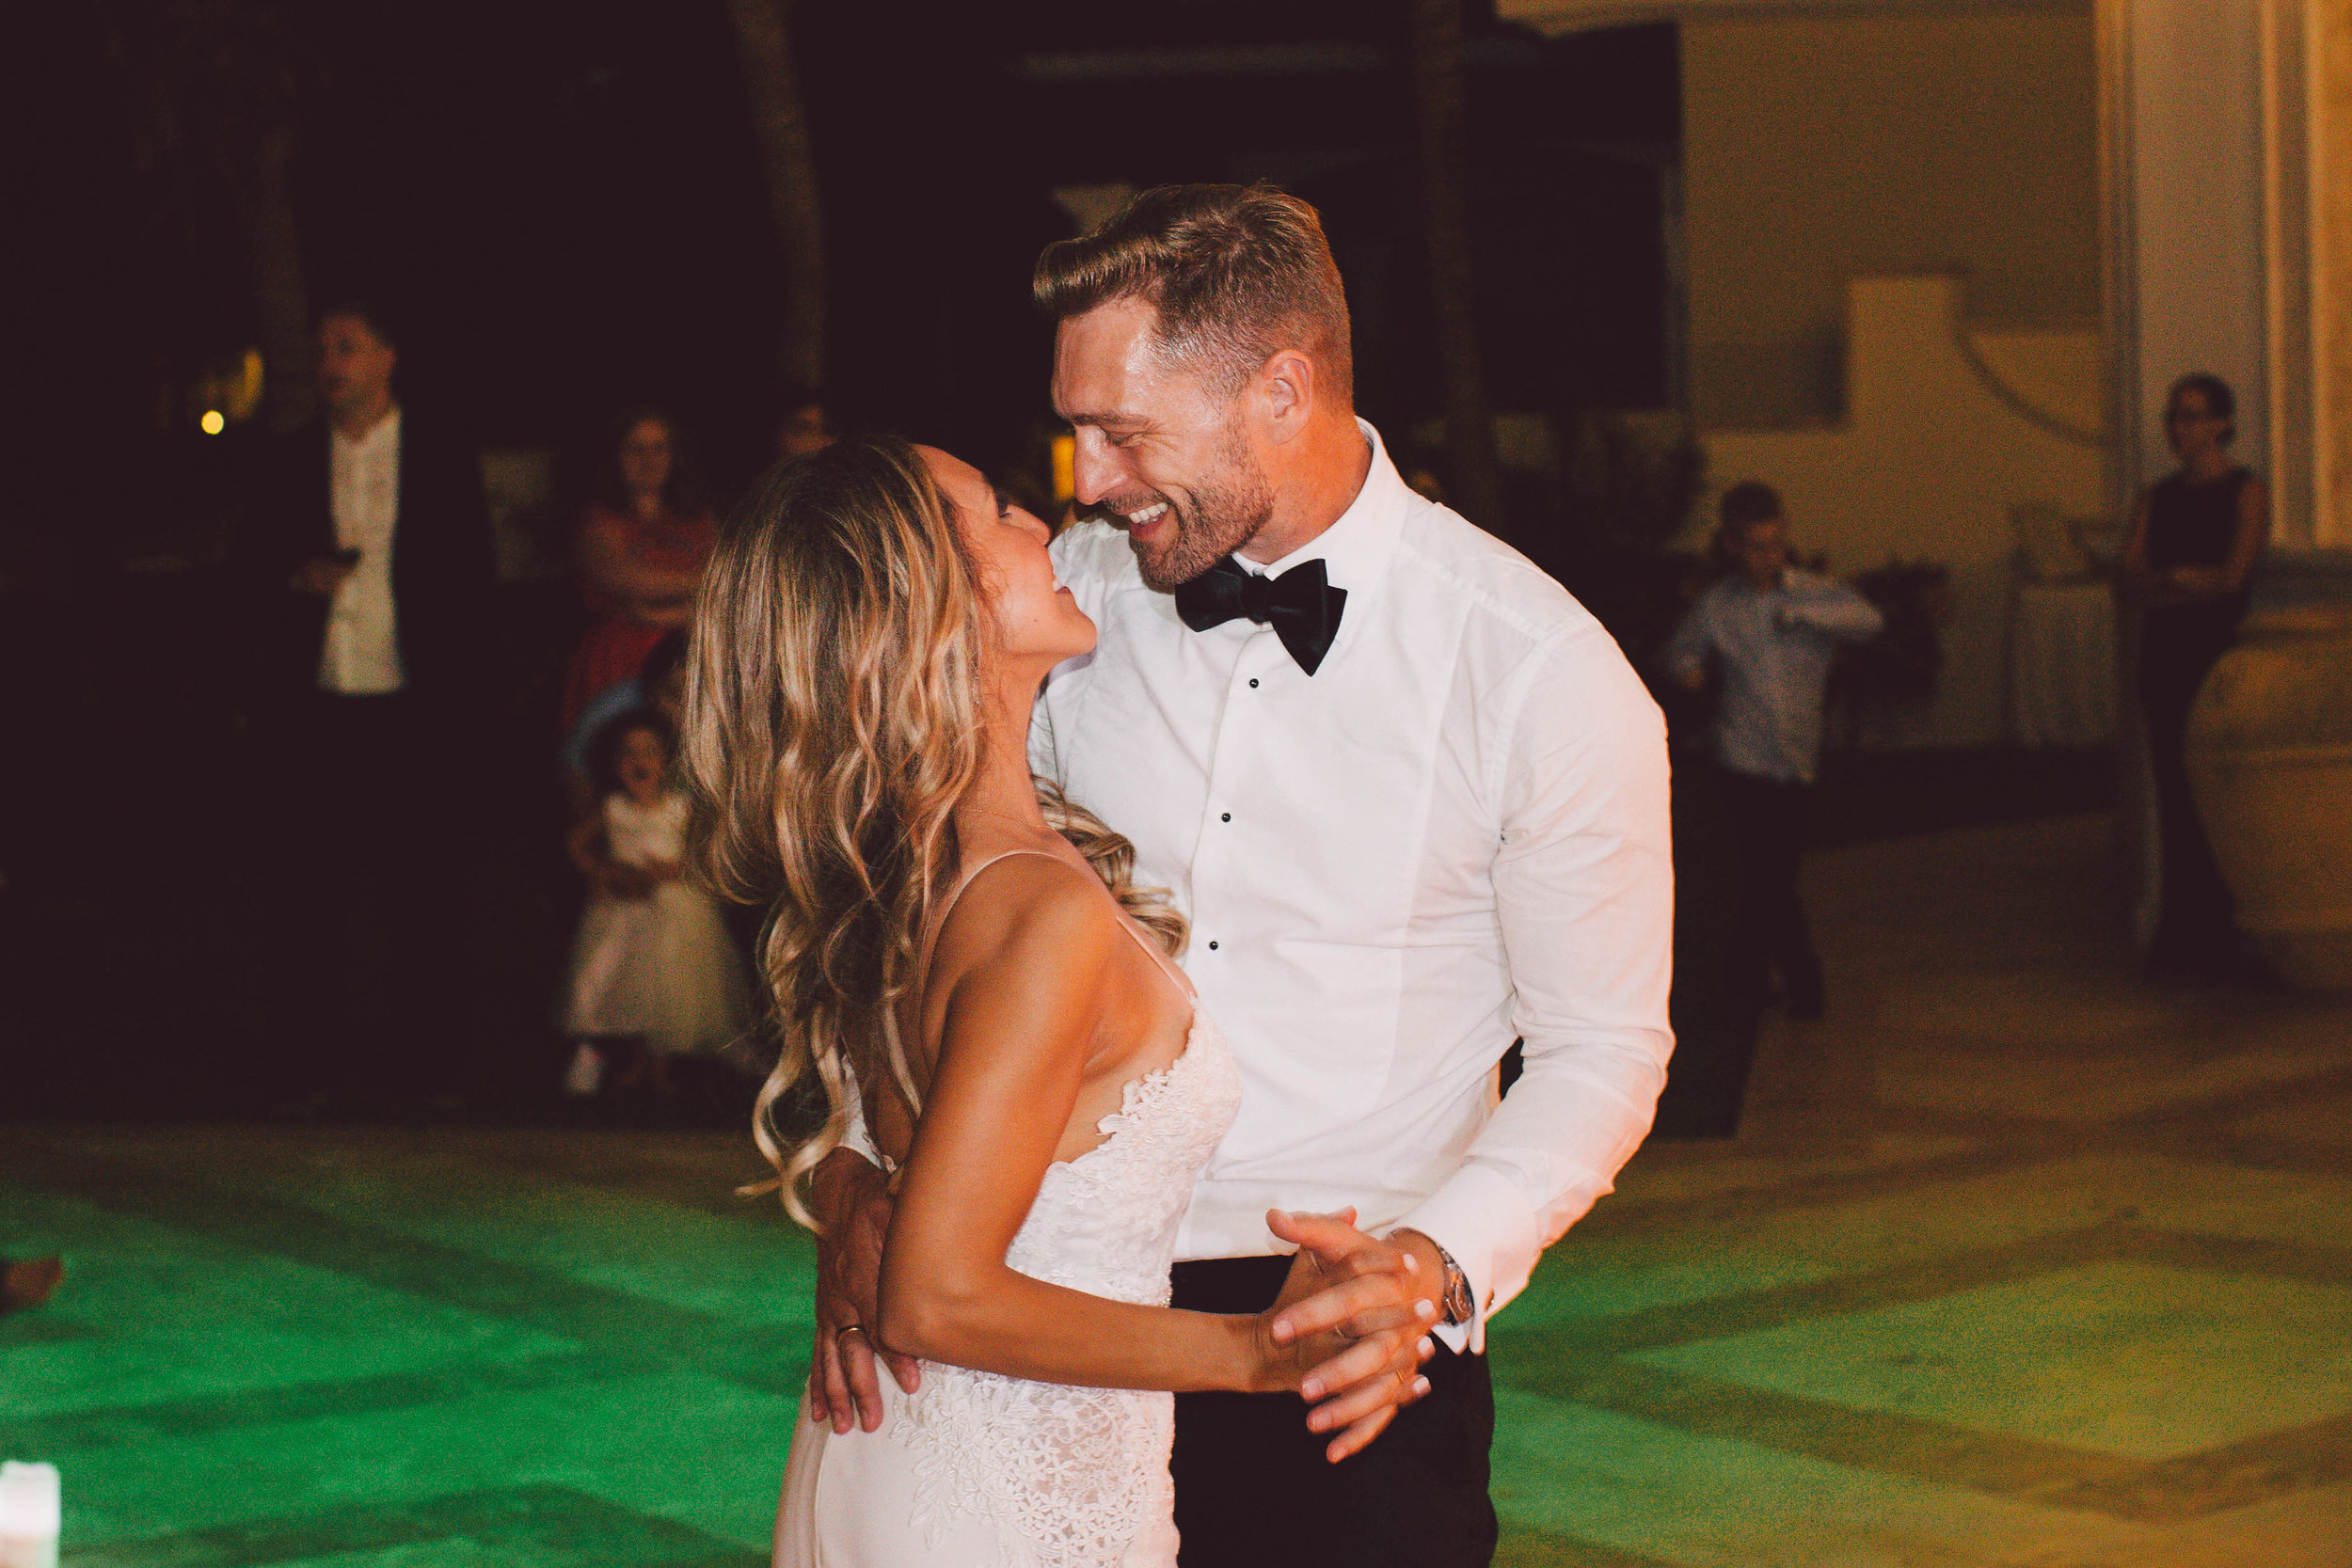 mexico_wedding_cancun_villa_la_joya_evangeline_lane_141.jpg